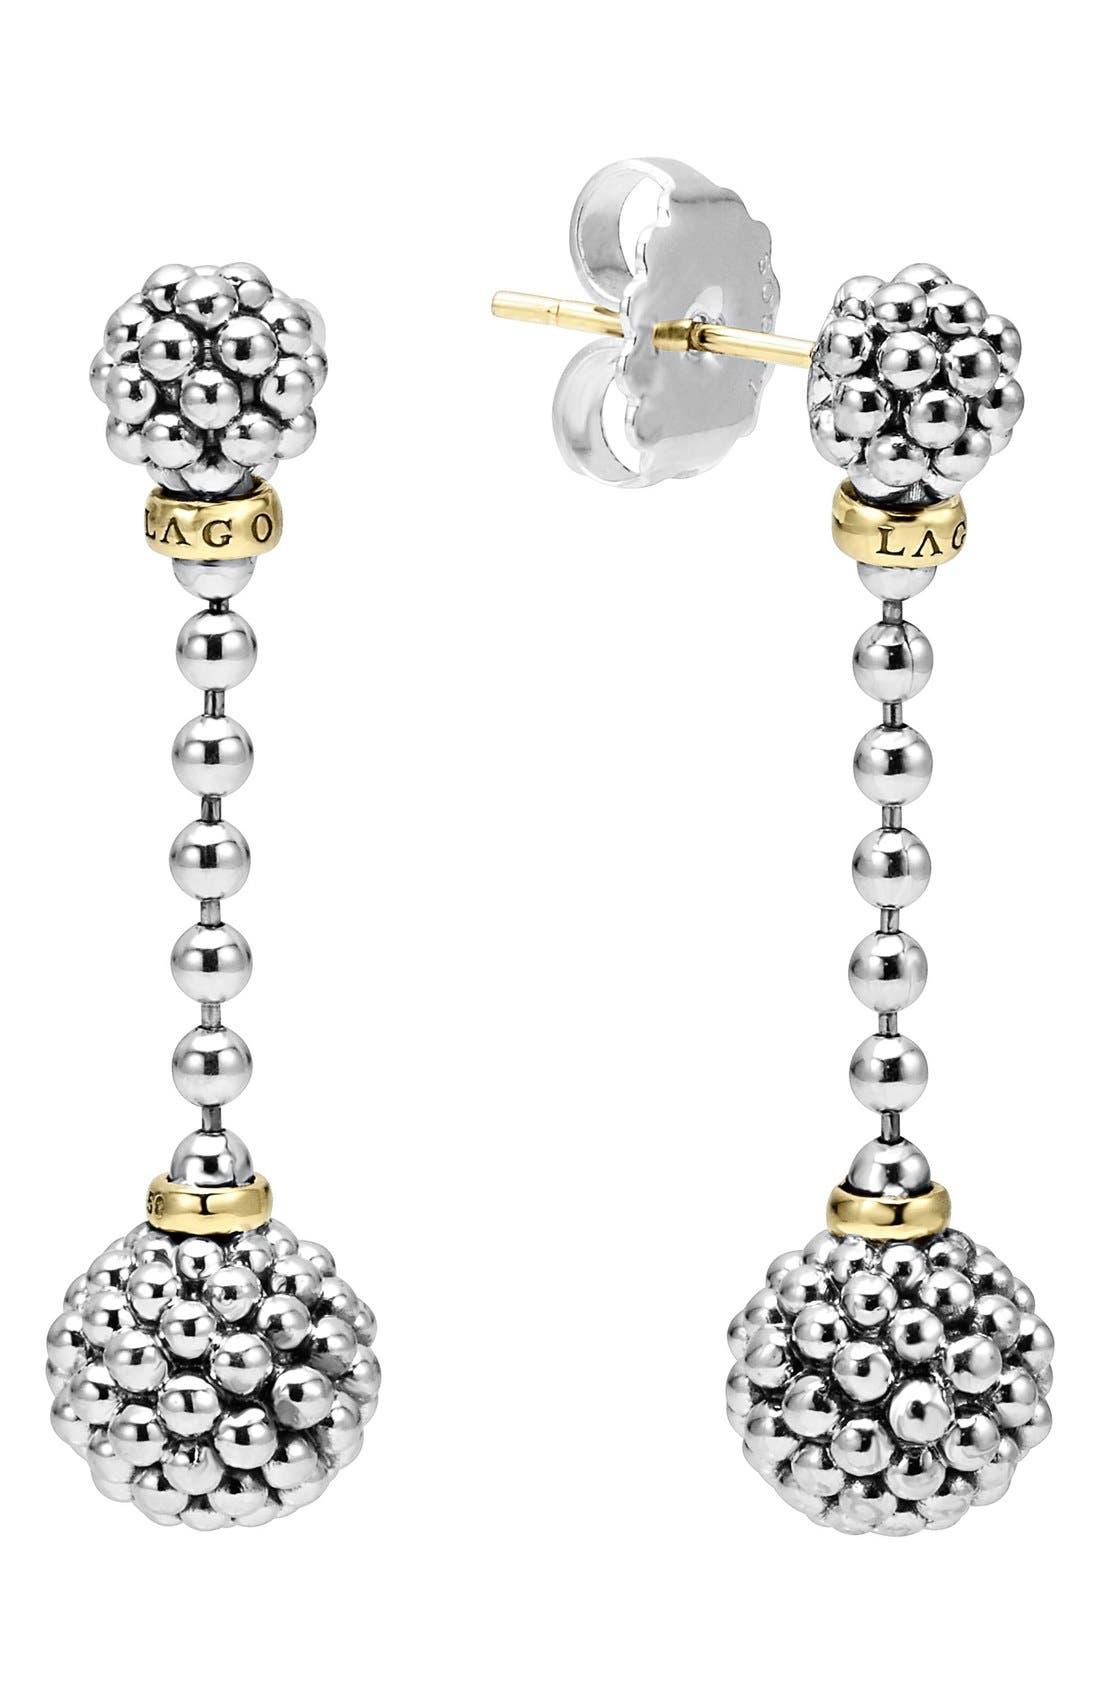 Caviar Lattice Ball Drop Earrings,                         Main,                         color, Silver/ Gold